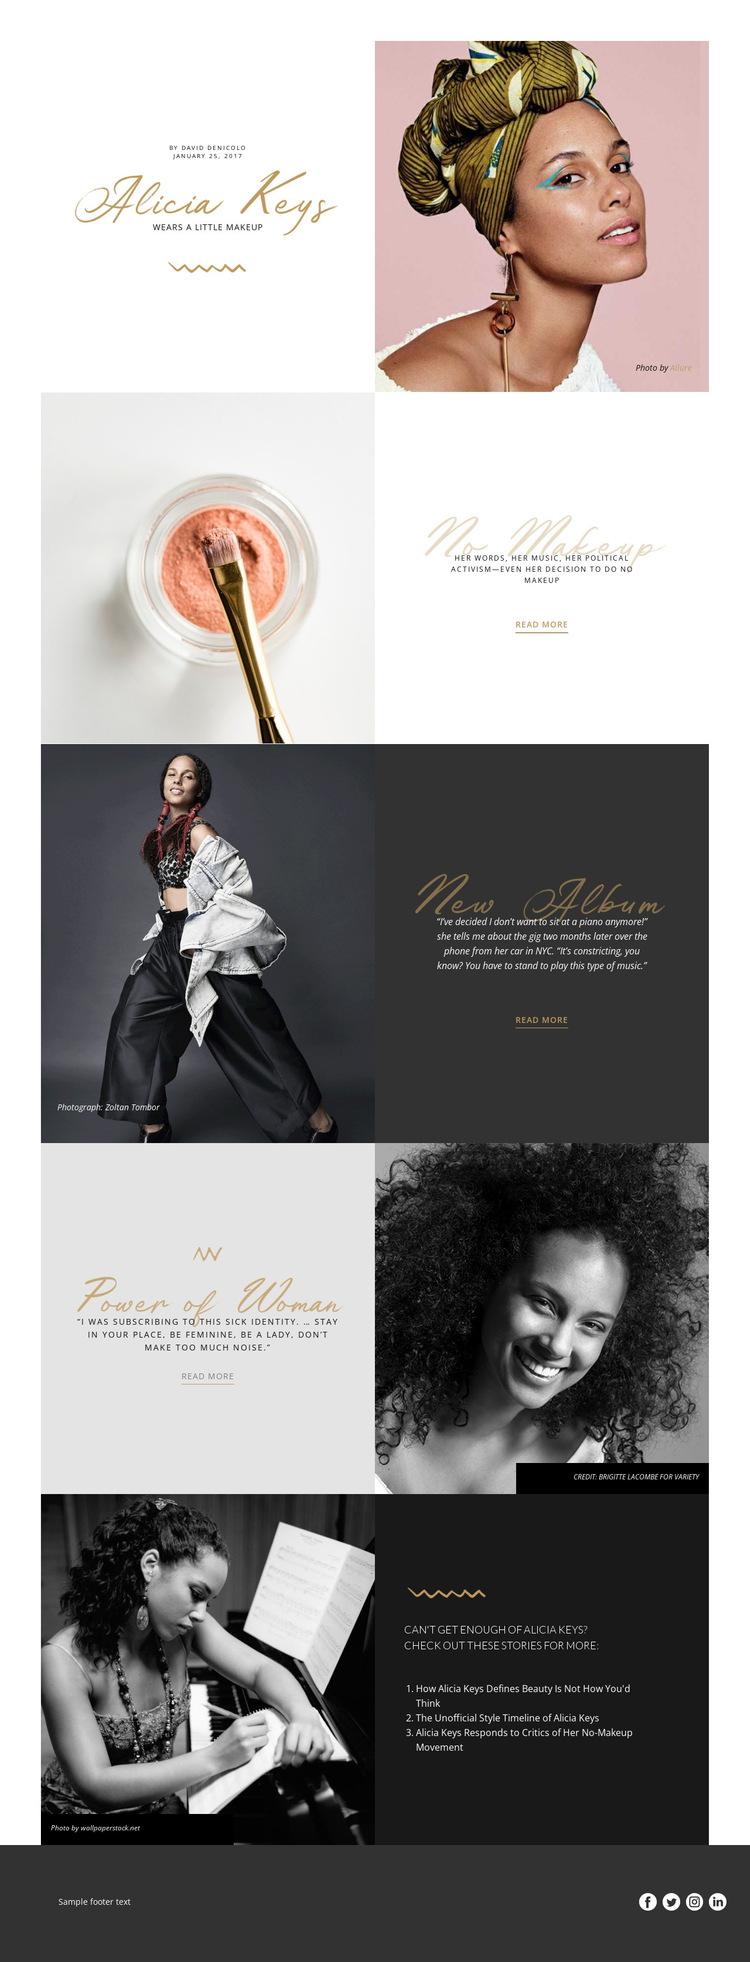 Alicia Keys HTML5 Template